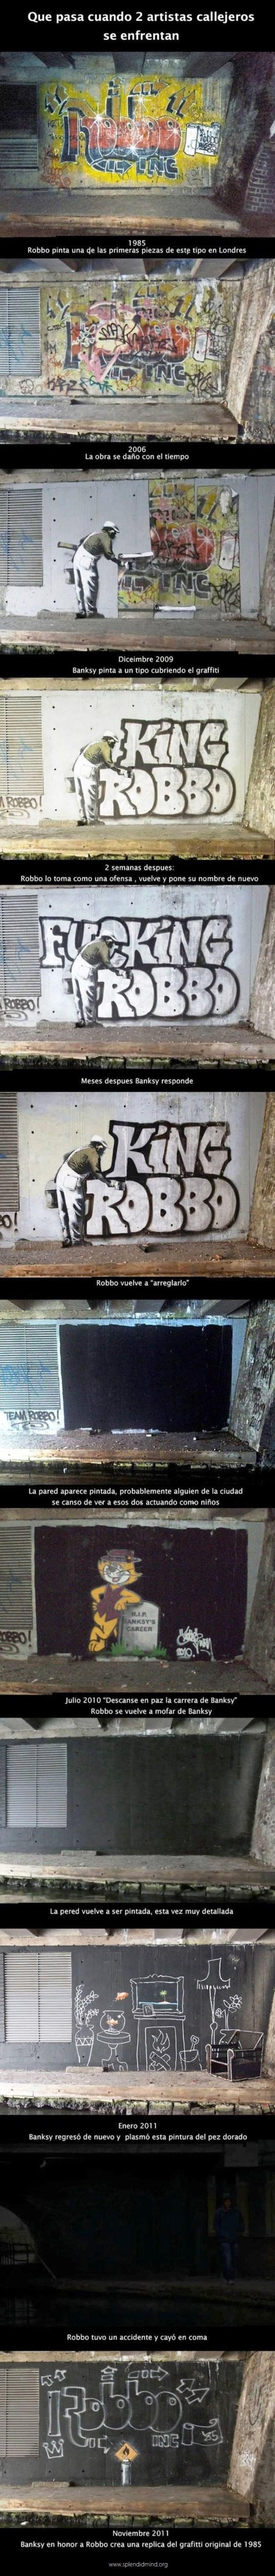 Guerra entre grafiteros